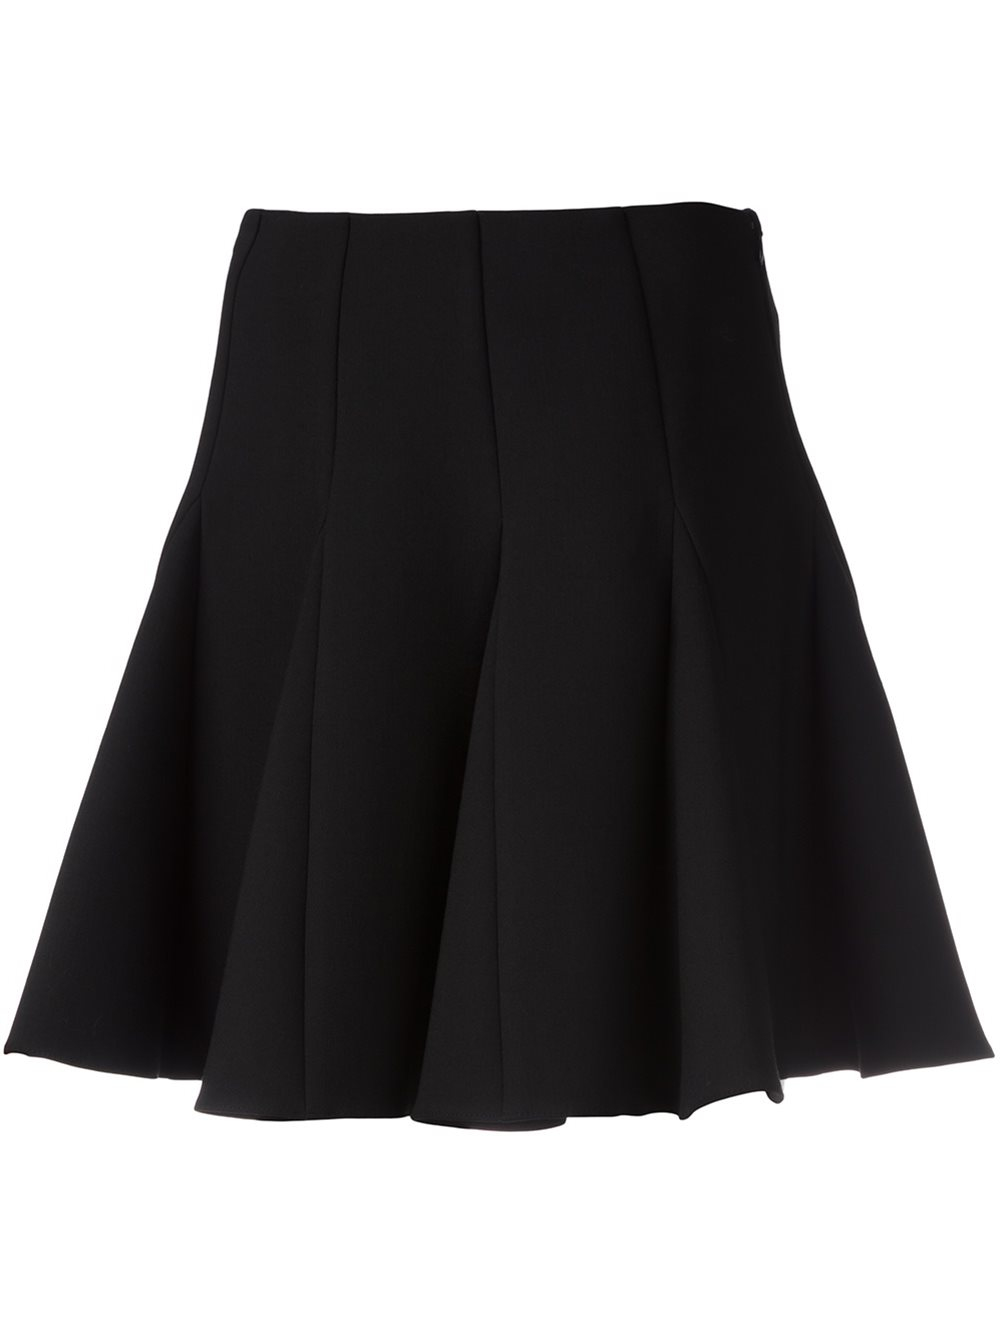 valentino a line mini skirt in black lyst